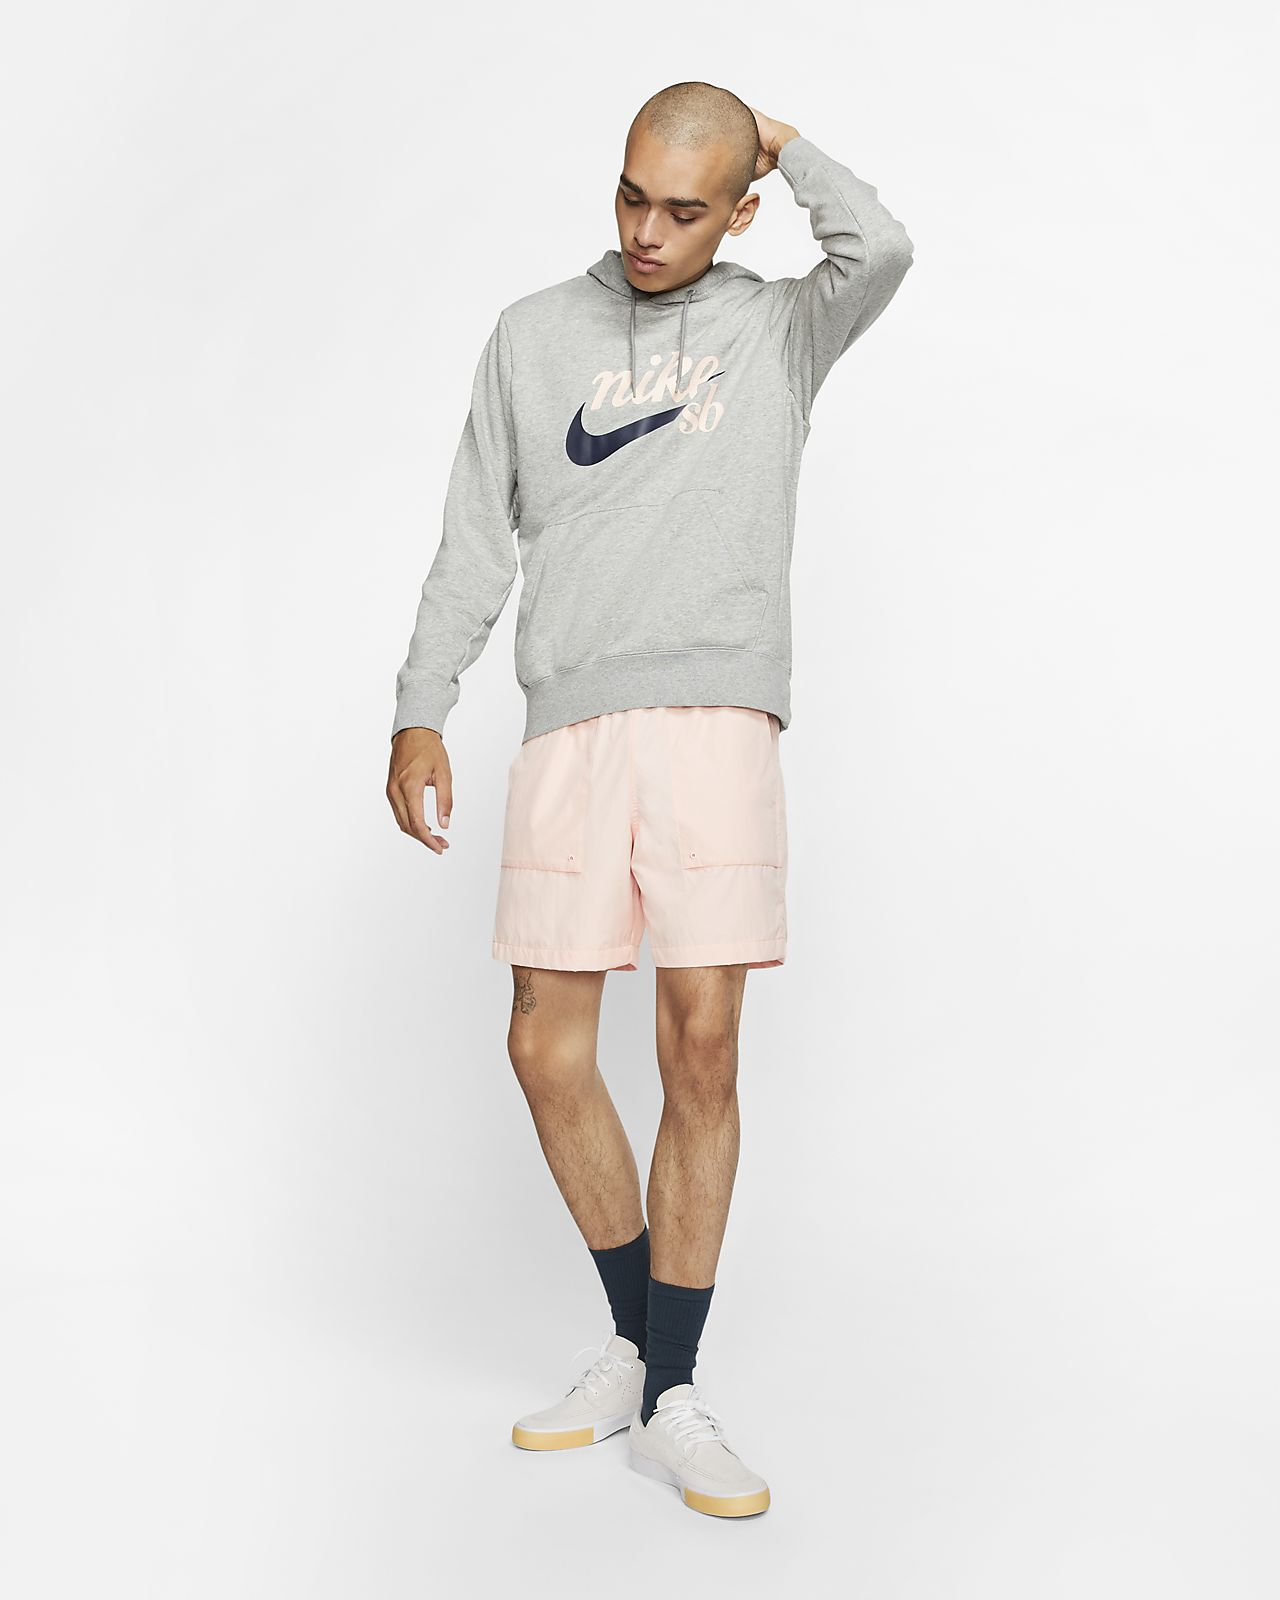 Nike SB Pantalón corto de skateboard